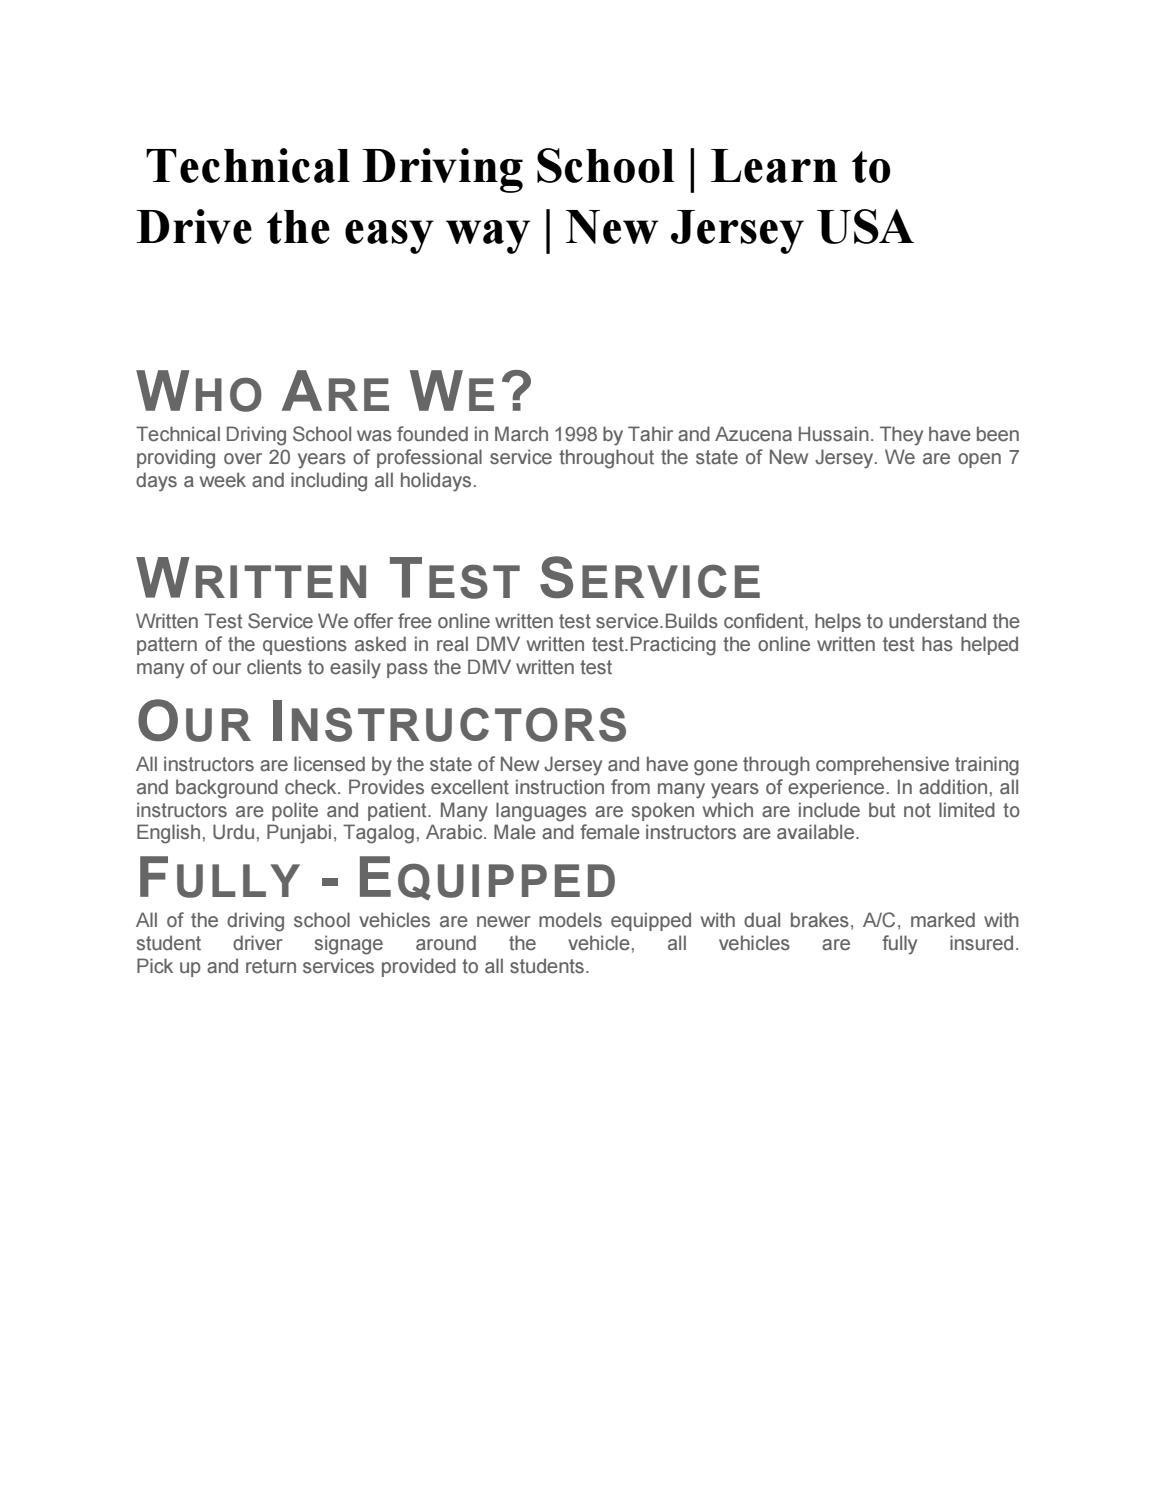 Best Driving school Brunswick NJ | Teens driving NJ |Tech driving